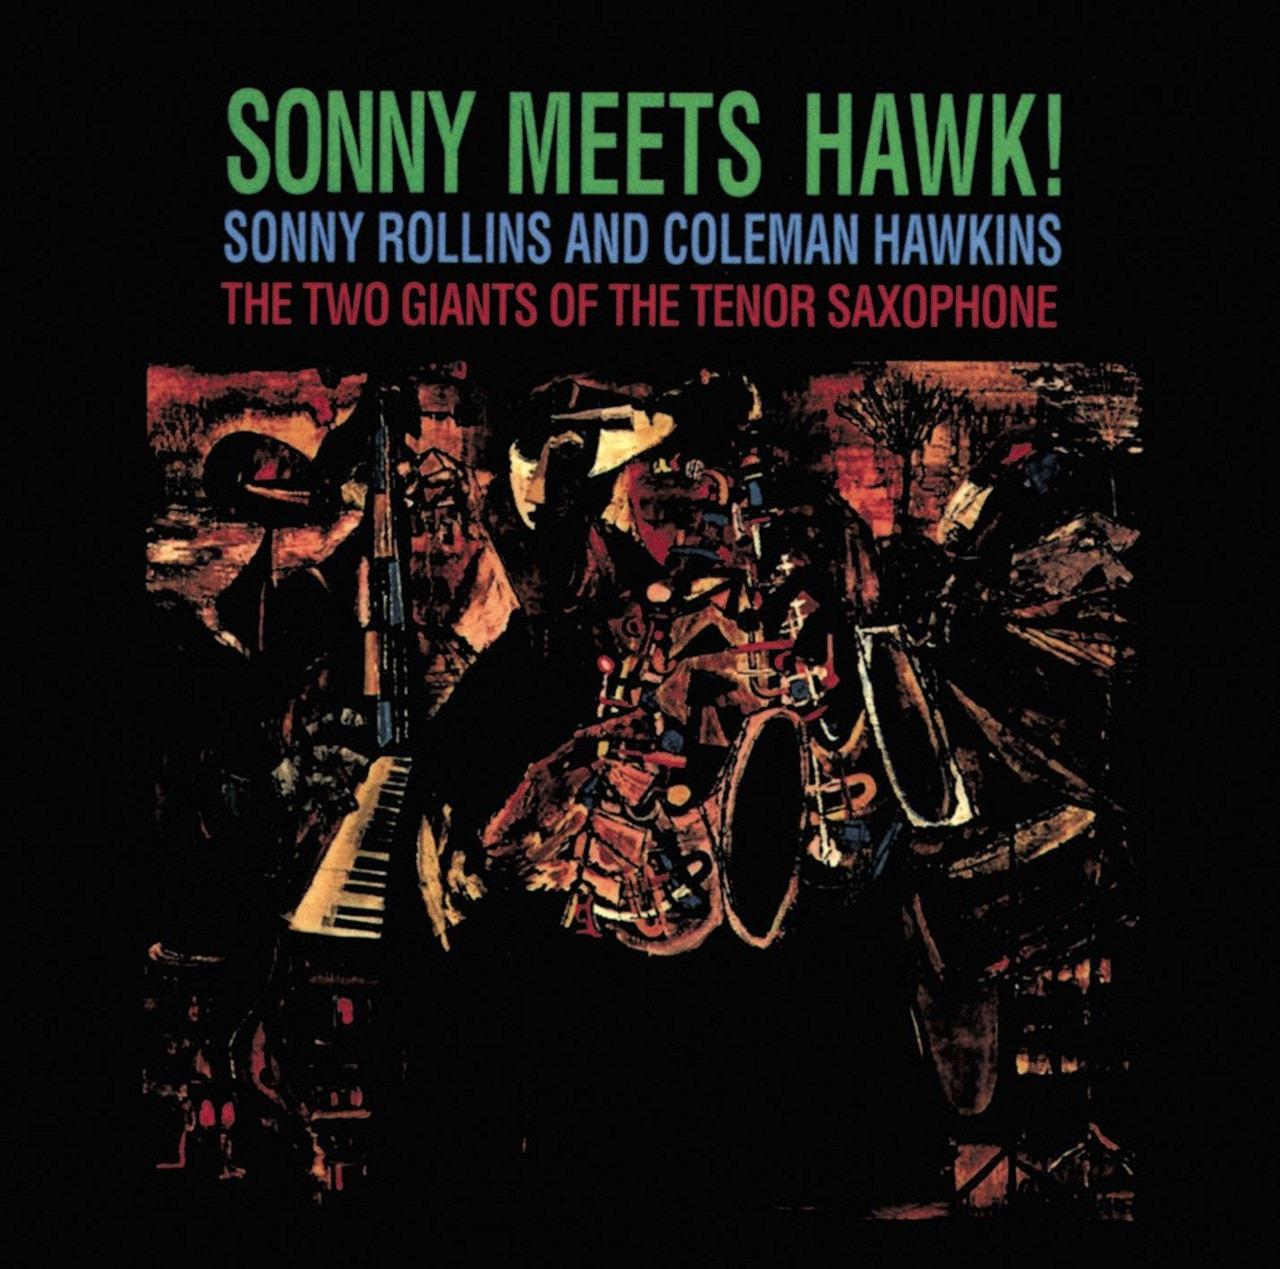 Sonny Rollins Meets the Hawk! - 1